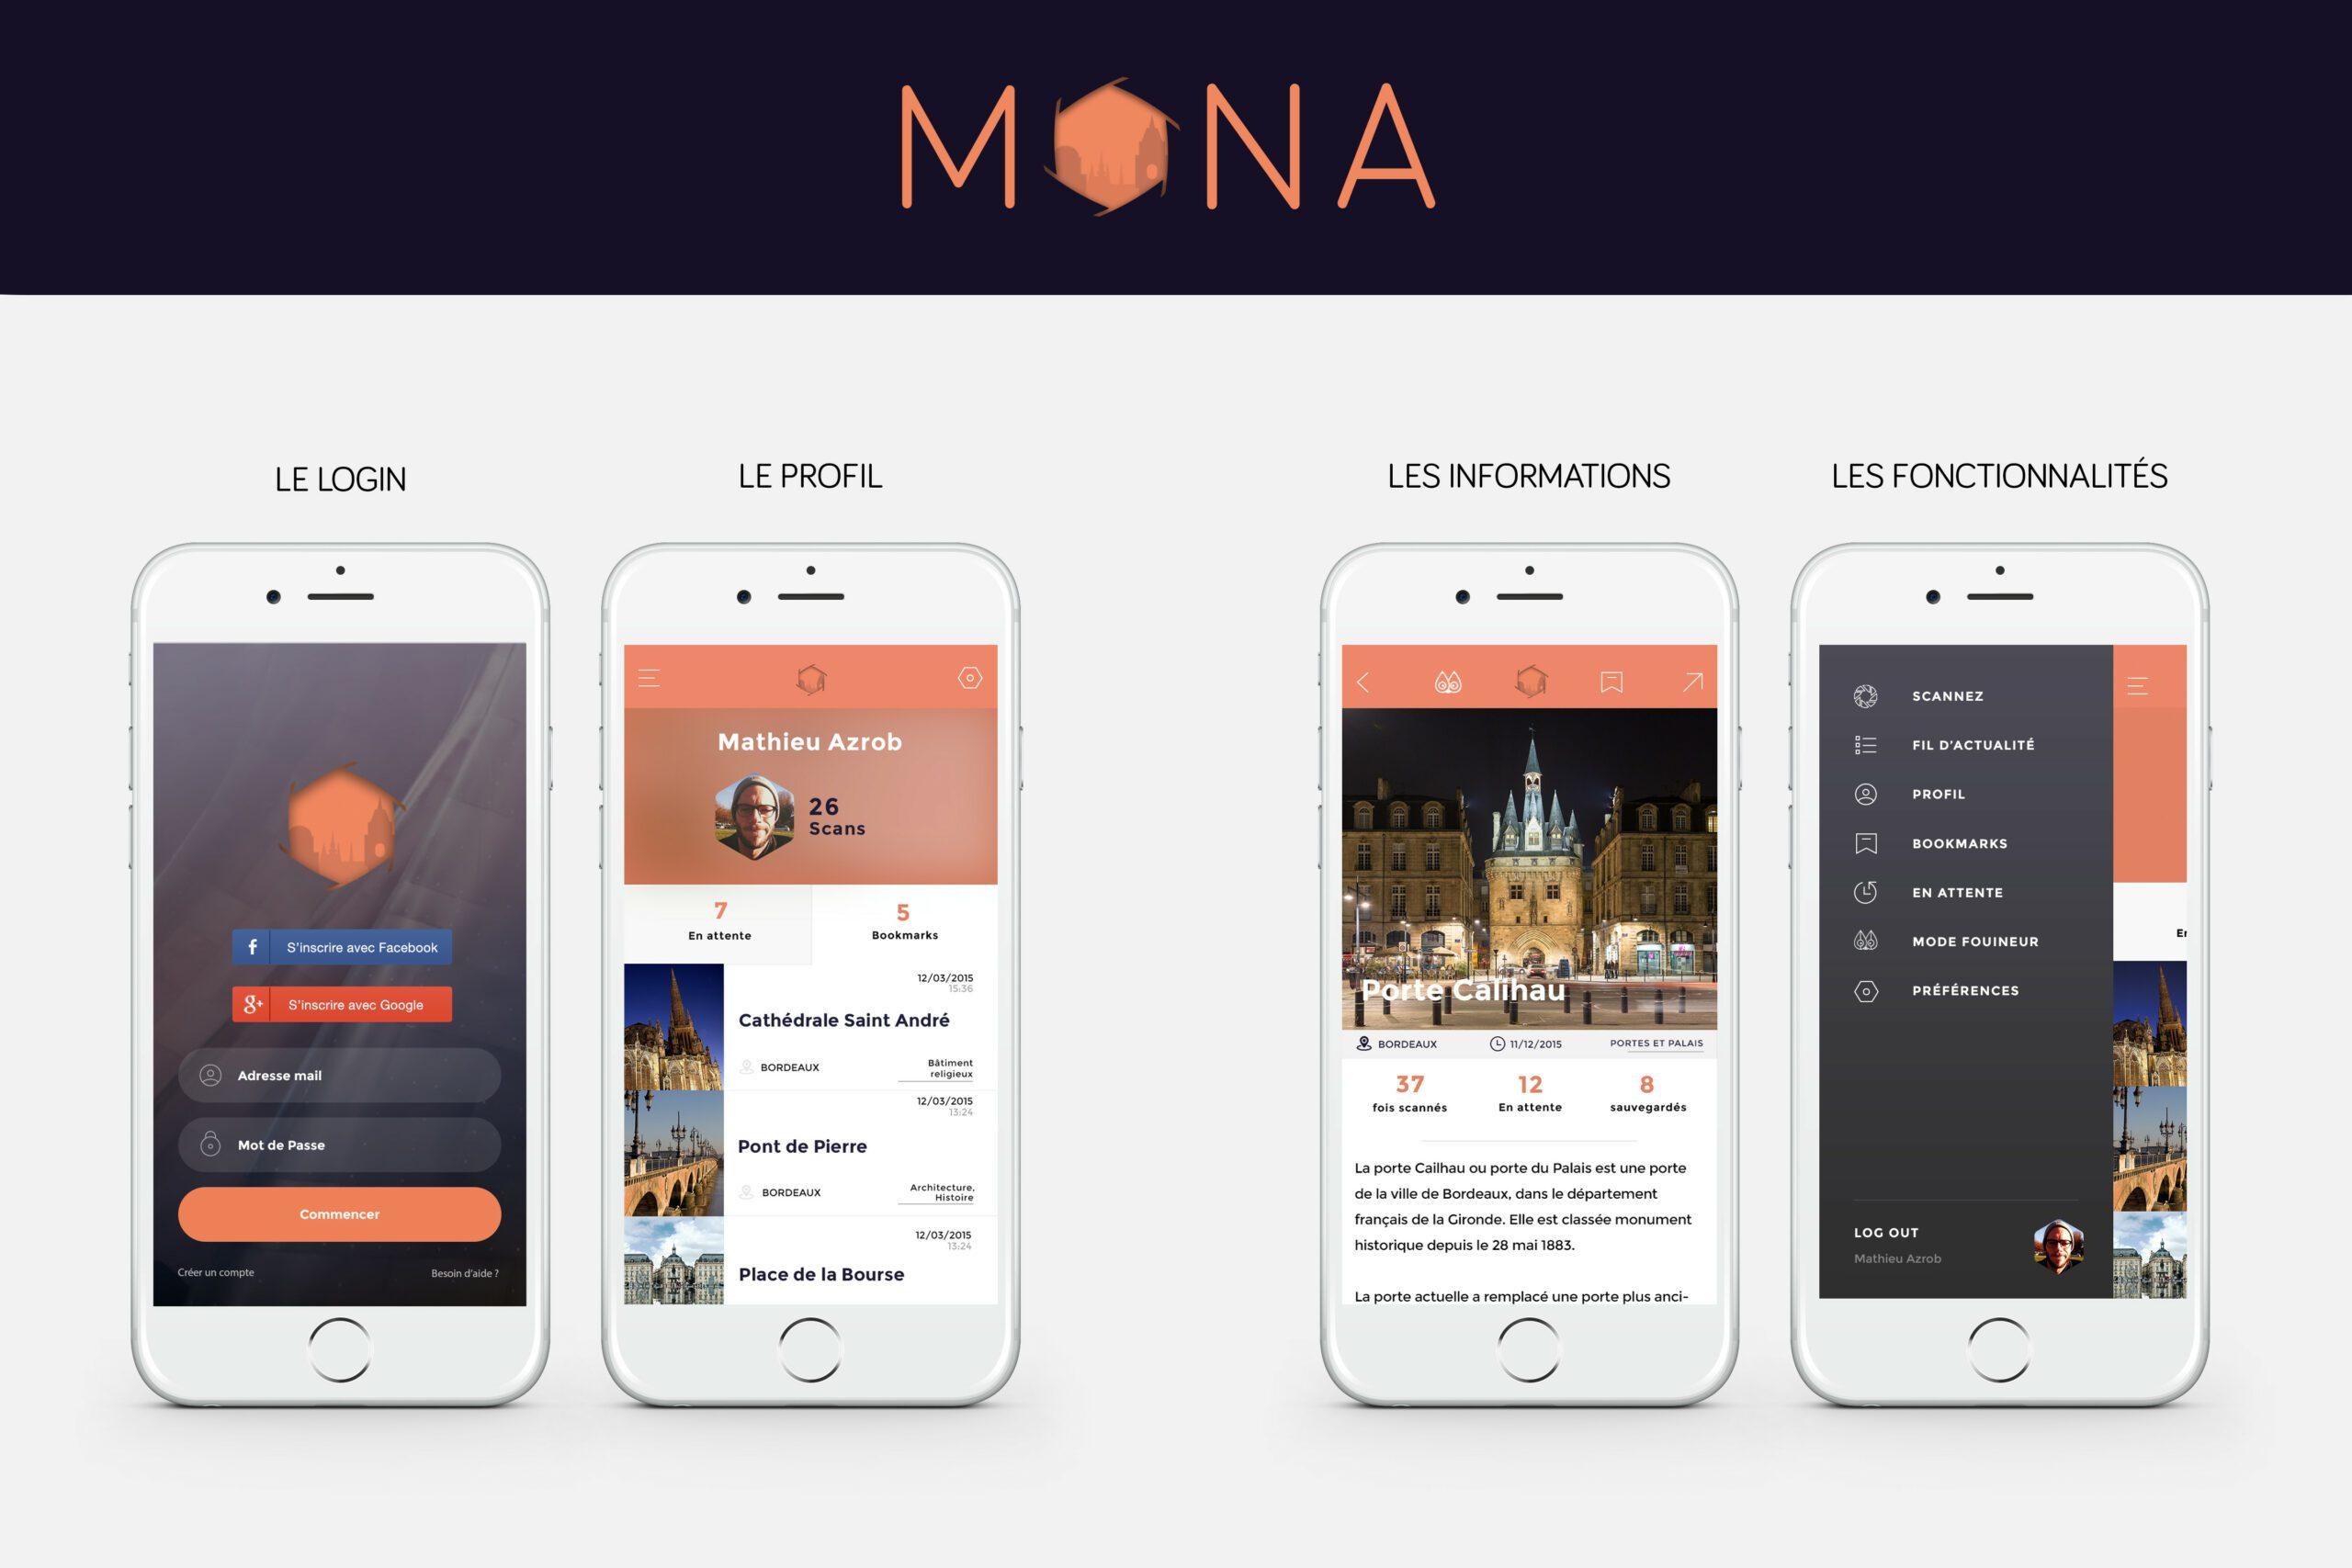 Mona - application mobile - concours - creads